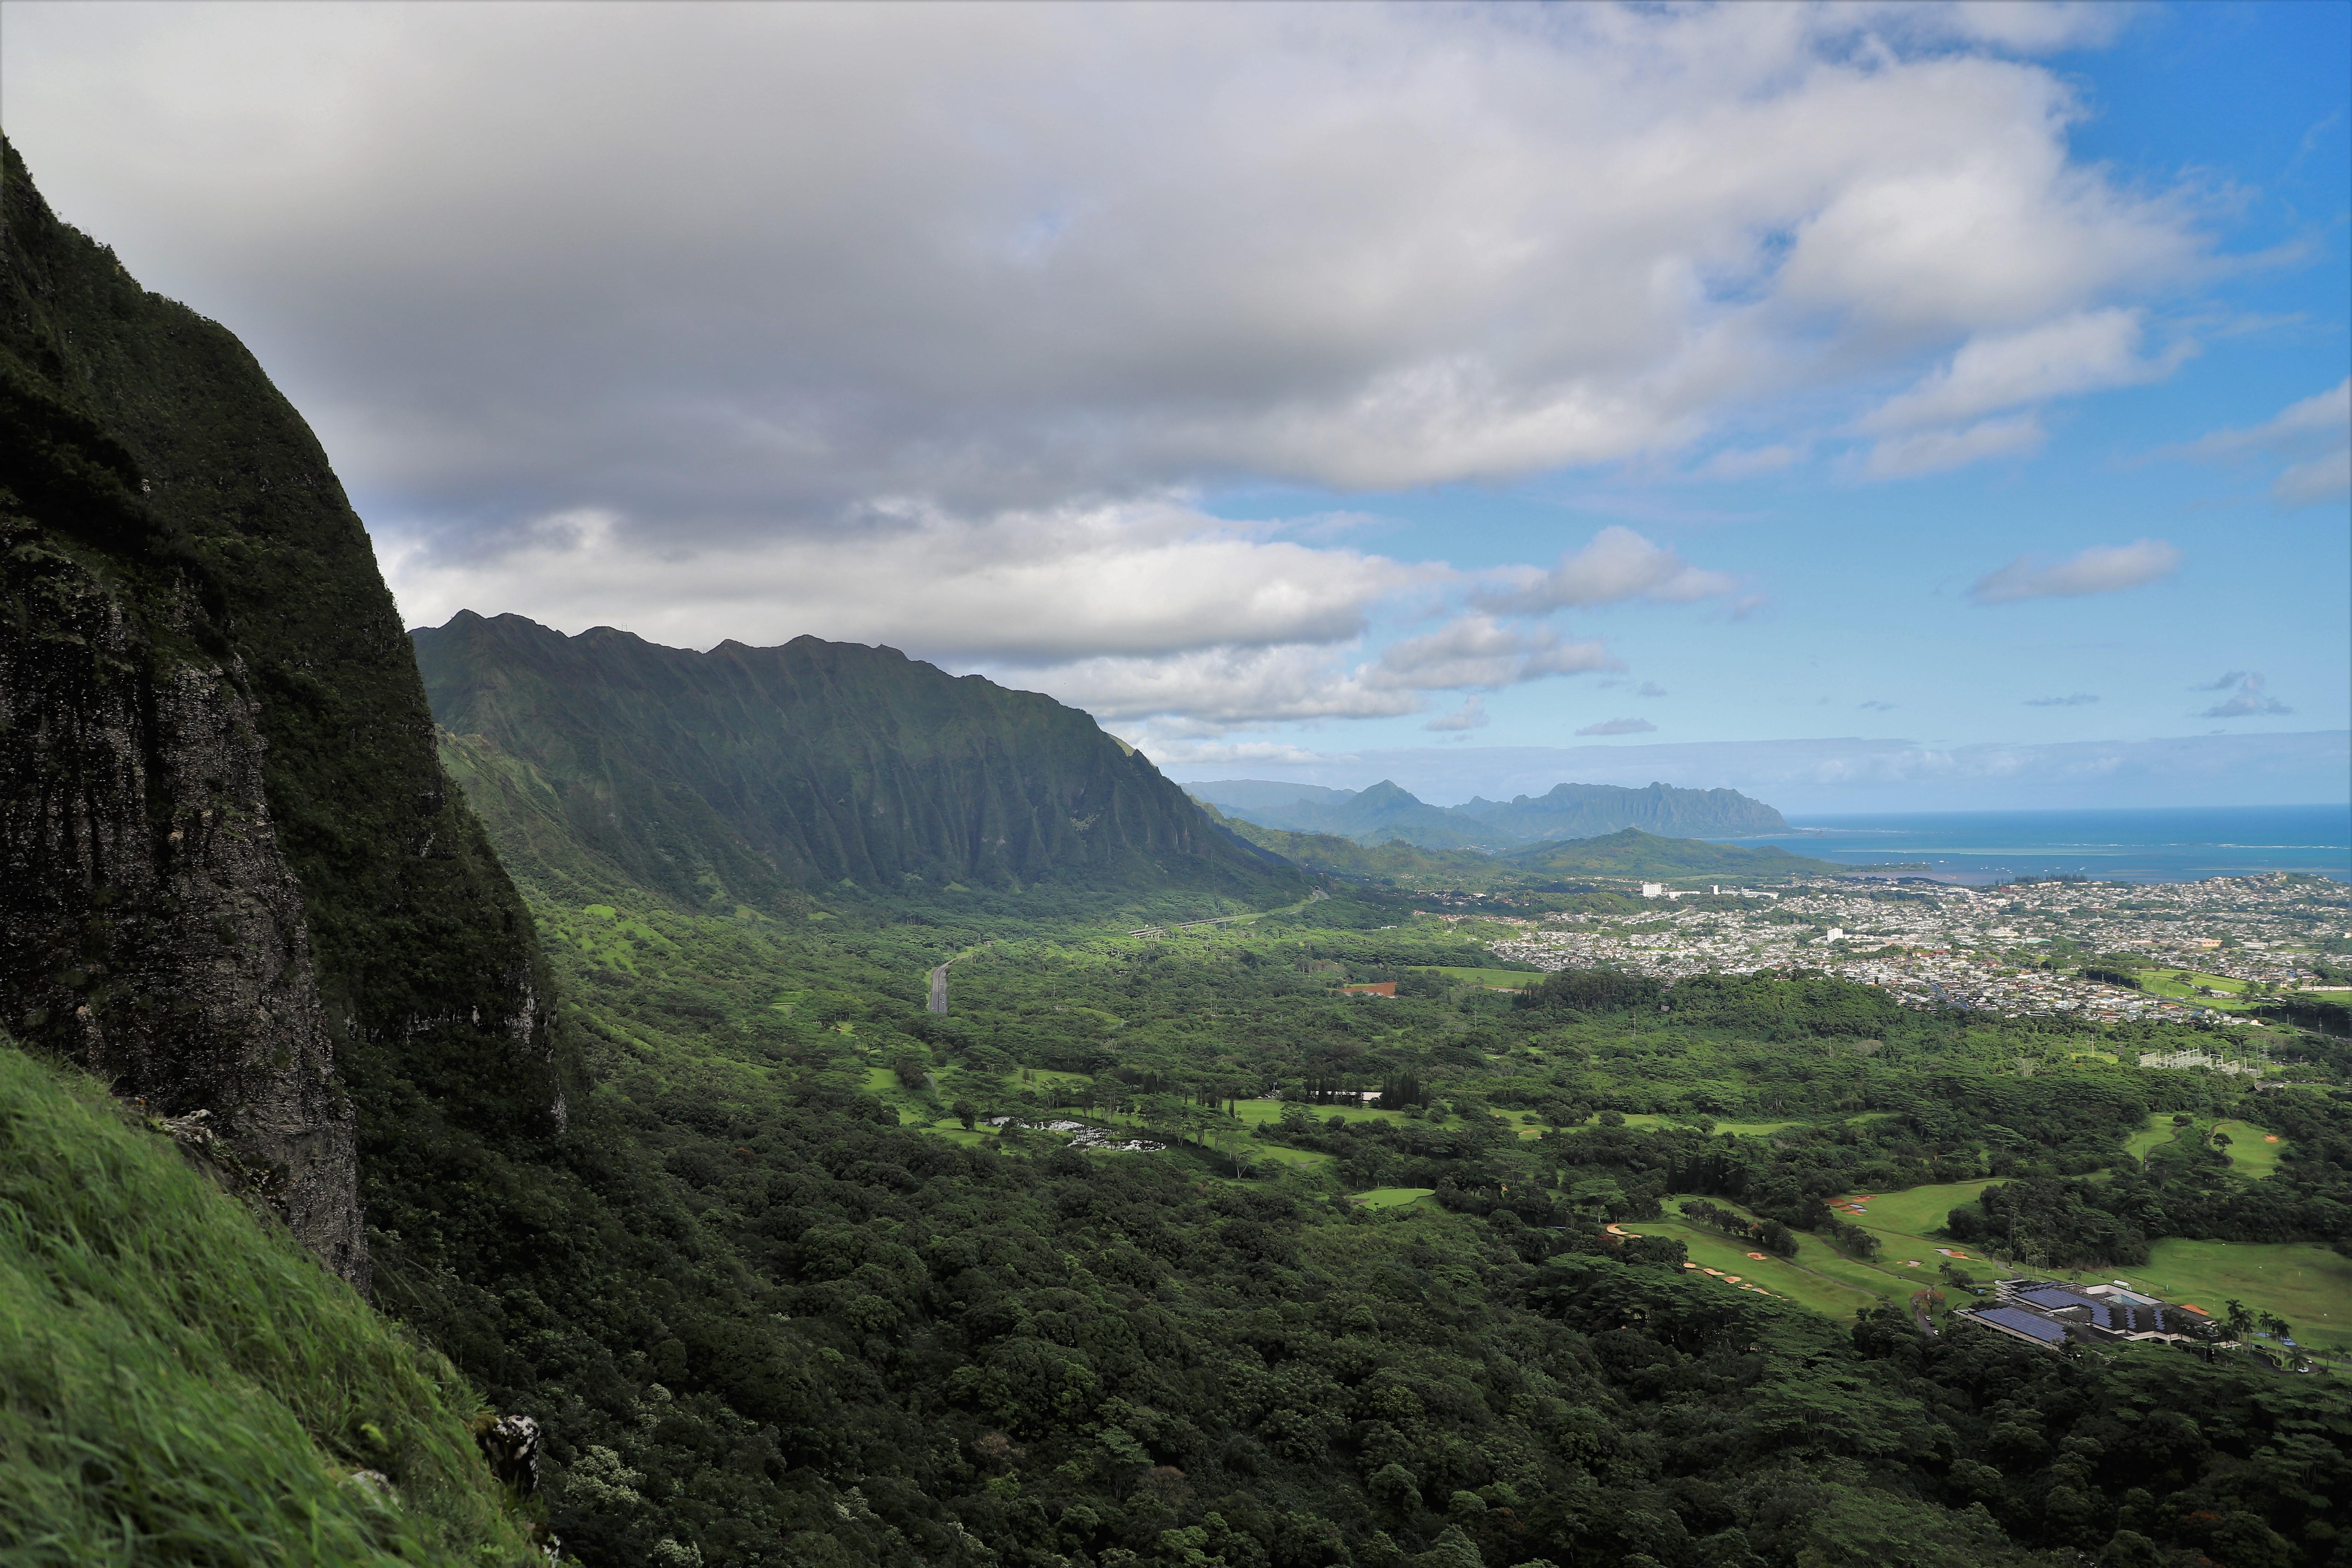 2018 11 11 55 Honolulu Pali Overlook.JPG